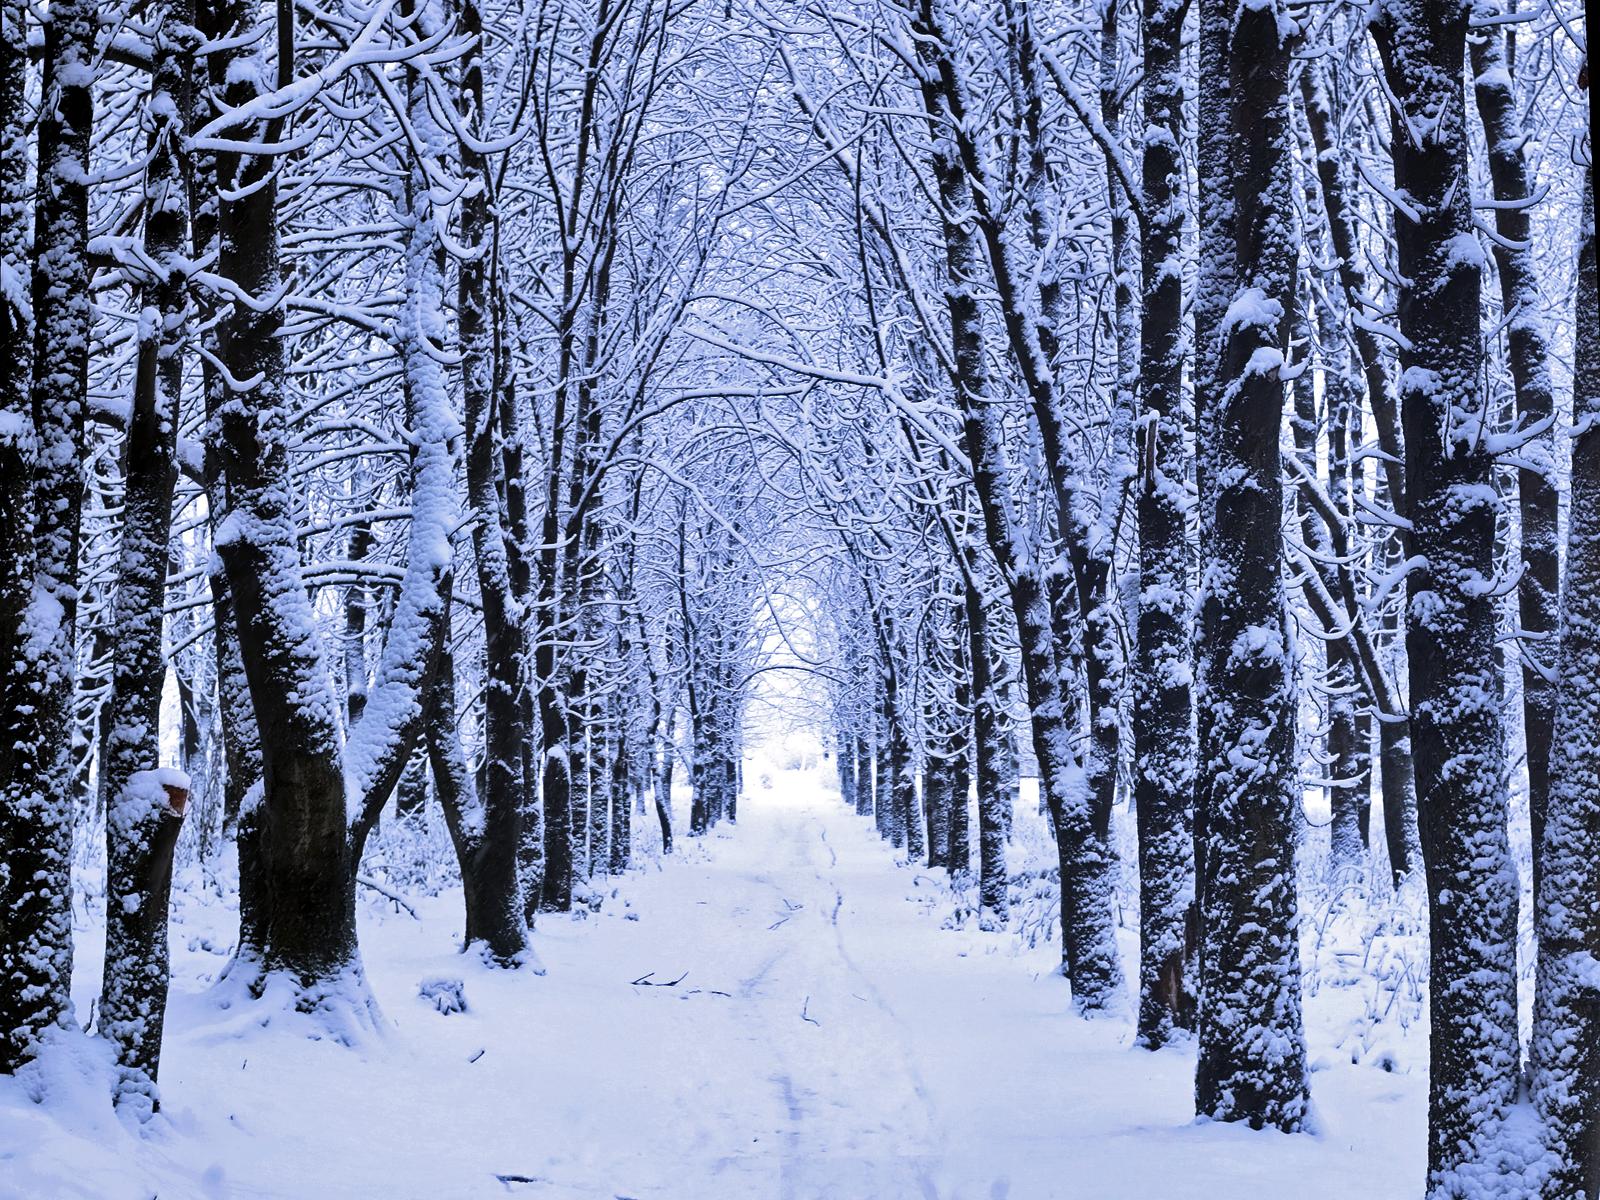 Winter Woods Snow Wallpaper Is The Ascendancy Of